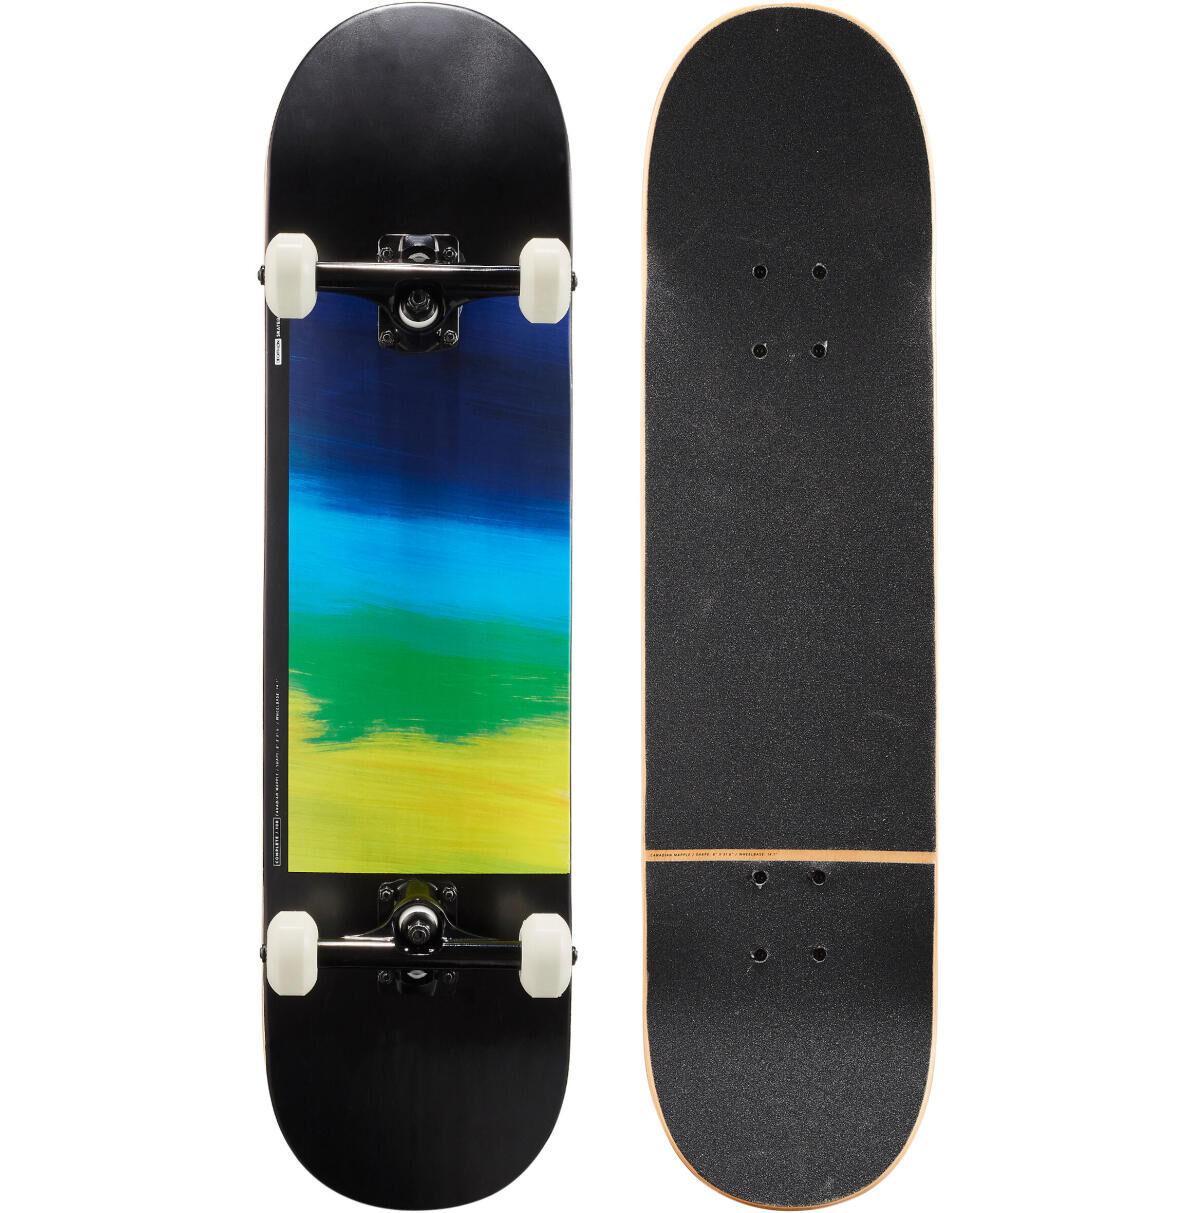 Skateboard | How To Choose Your Skateboard?